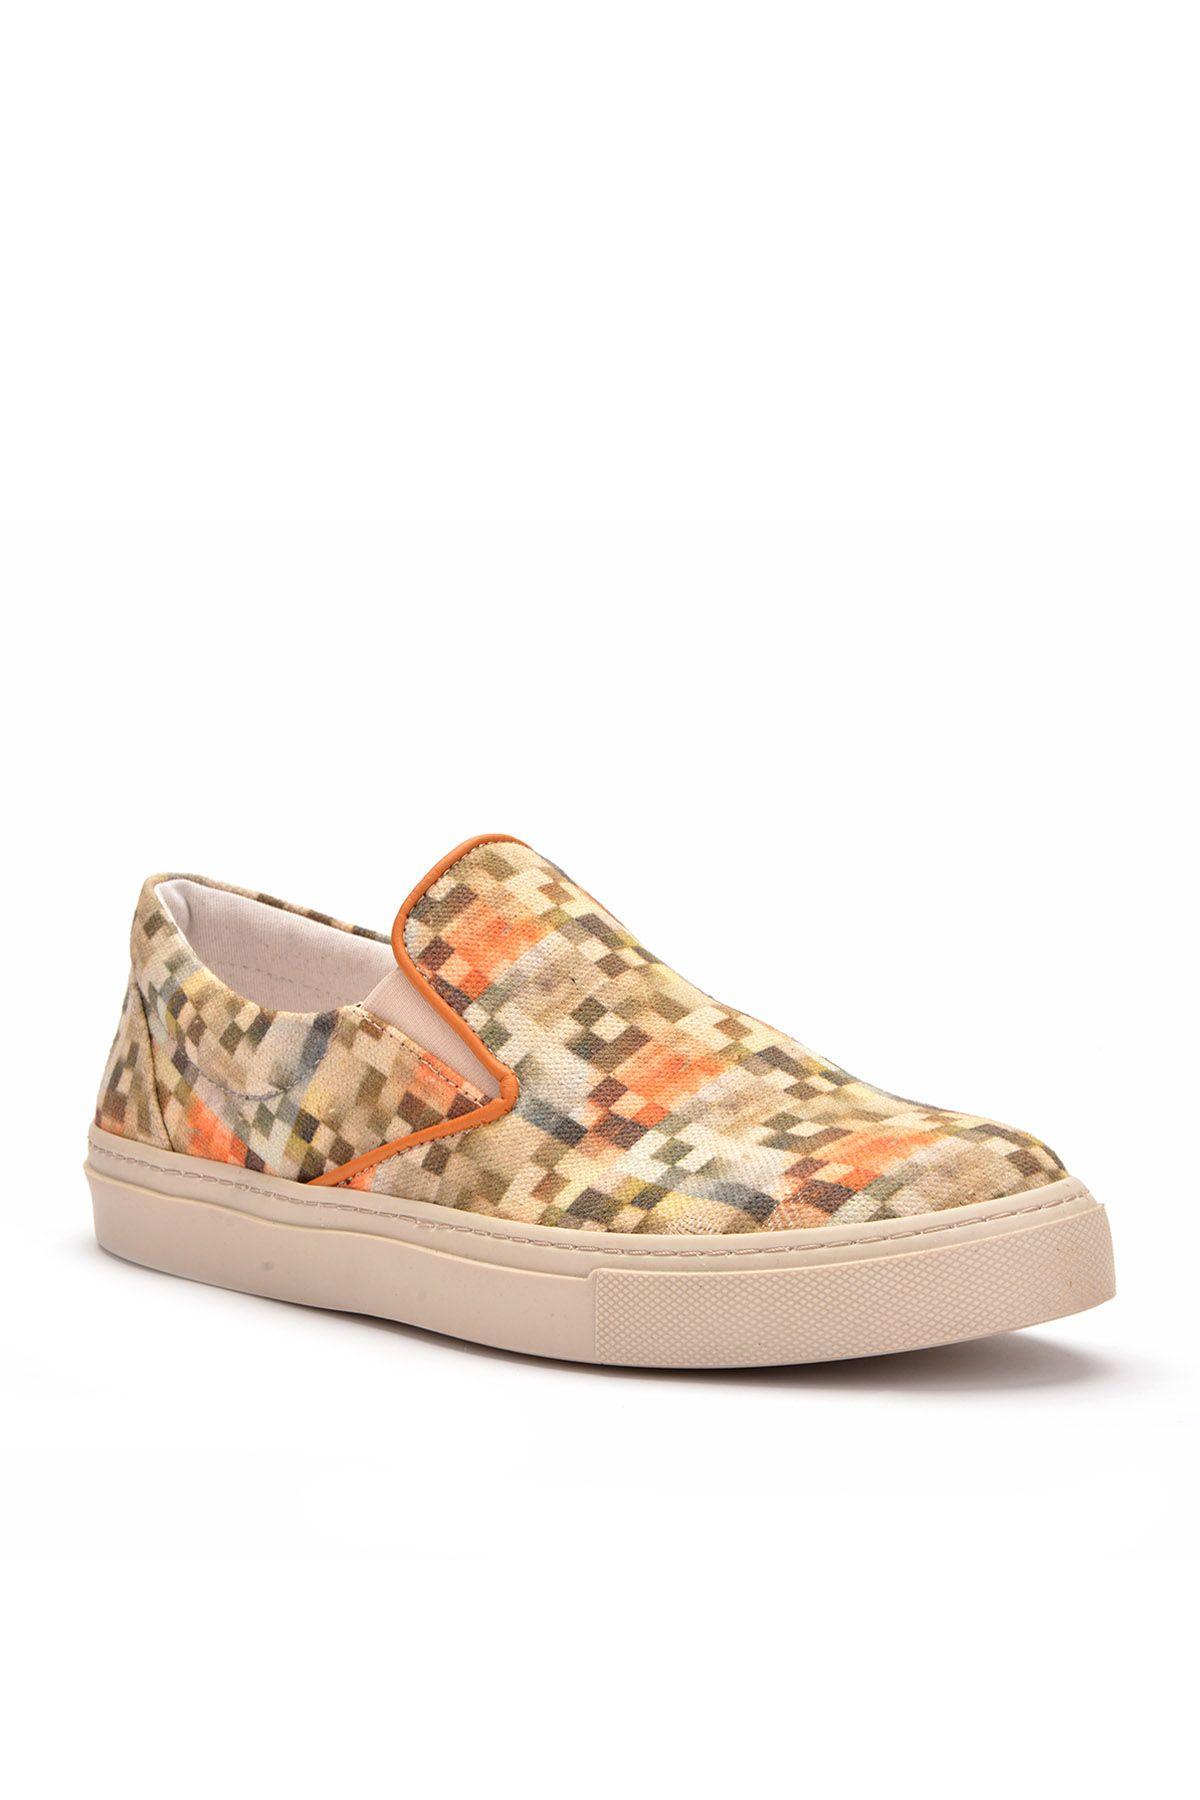 Art Goya Linen Women Sneakers With Square Pattern Cream